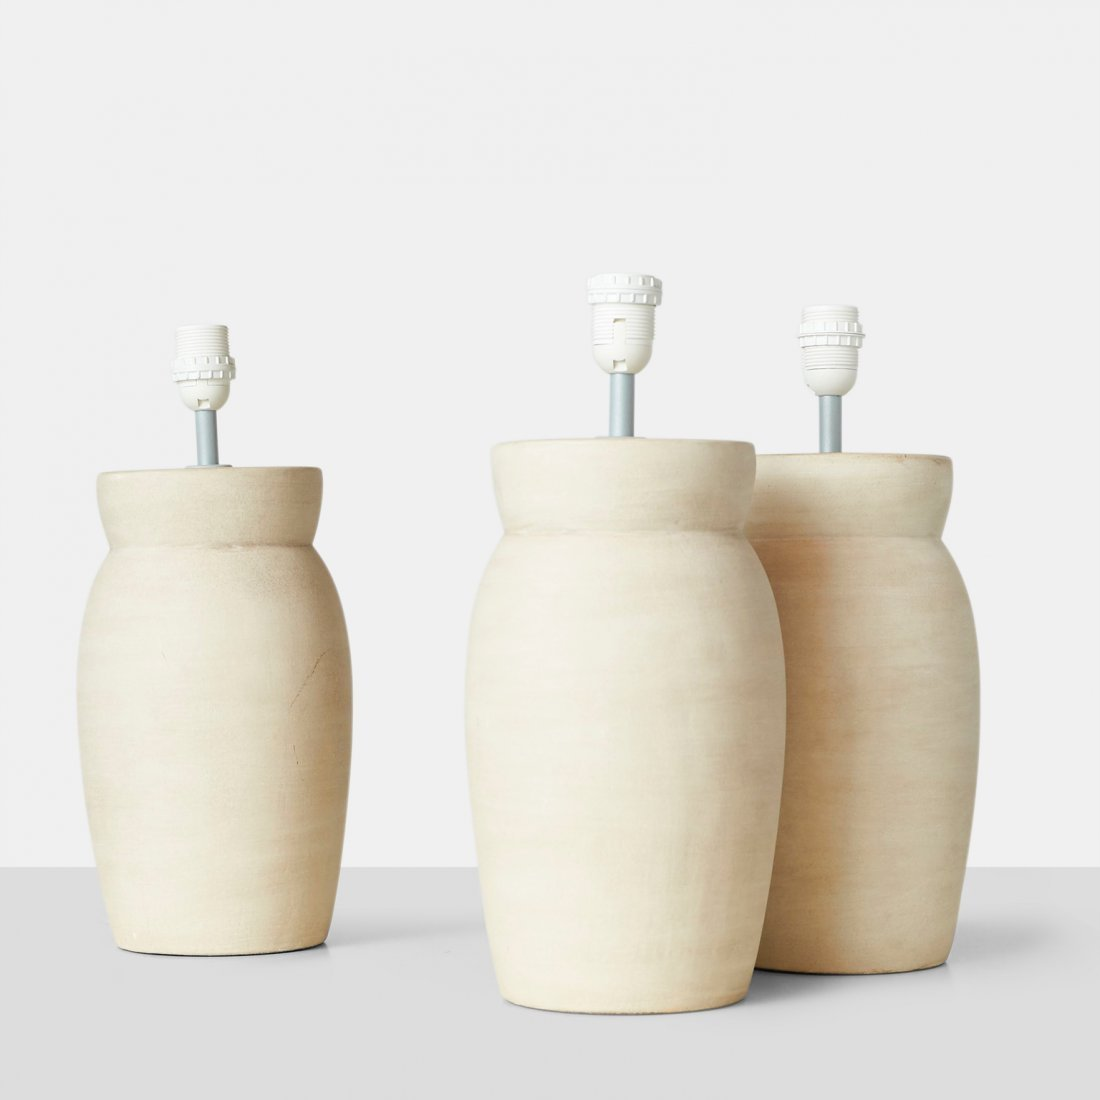 Set of 3 Ceramic Table Lamps by Frandsen